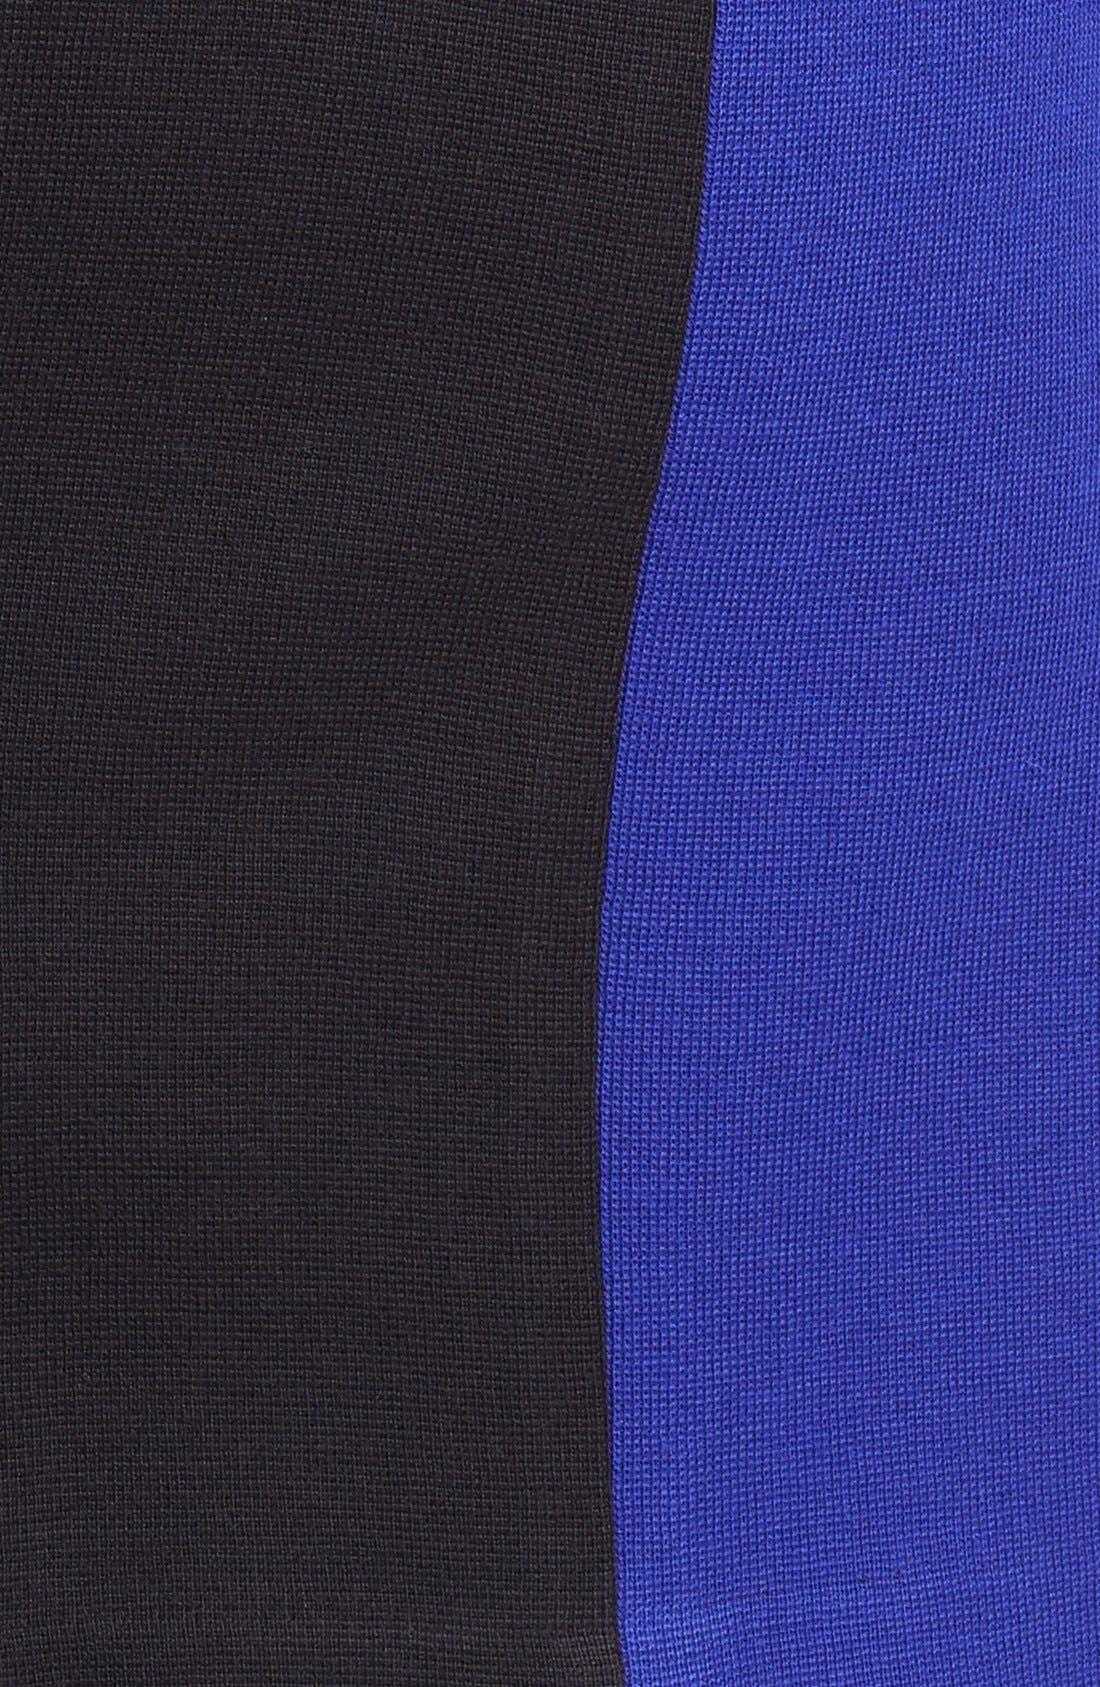 Alternate Image 3  - Milly Colorblock Sheath Dress